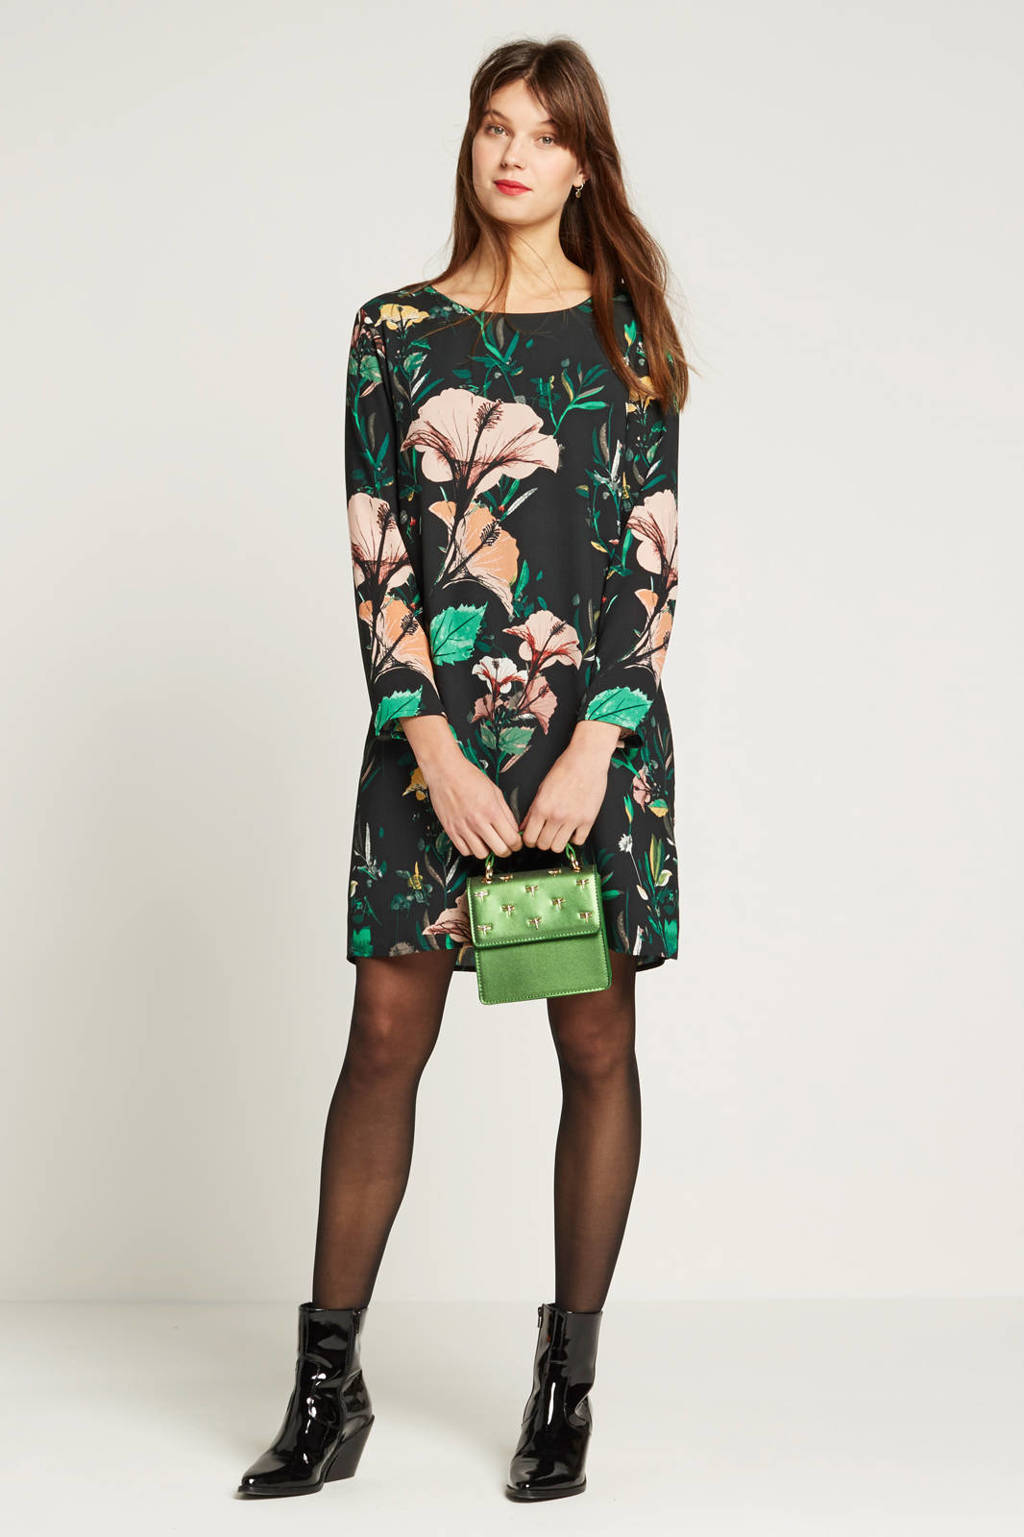 ONLY jurk met rugdecolleté, Donkergroen